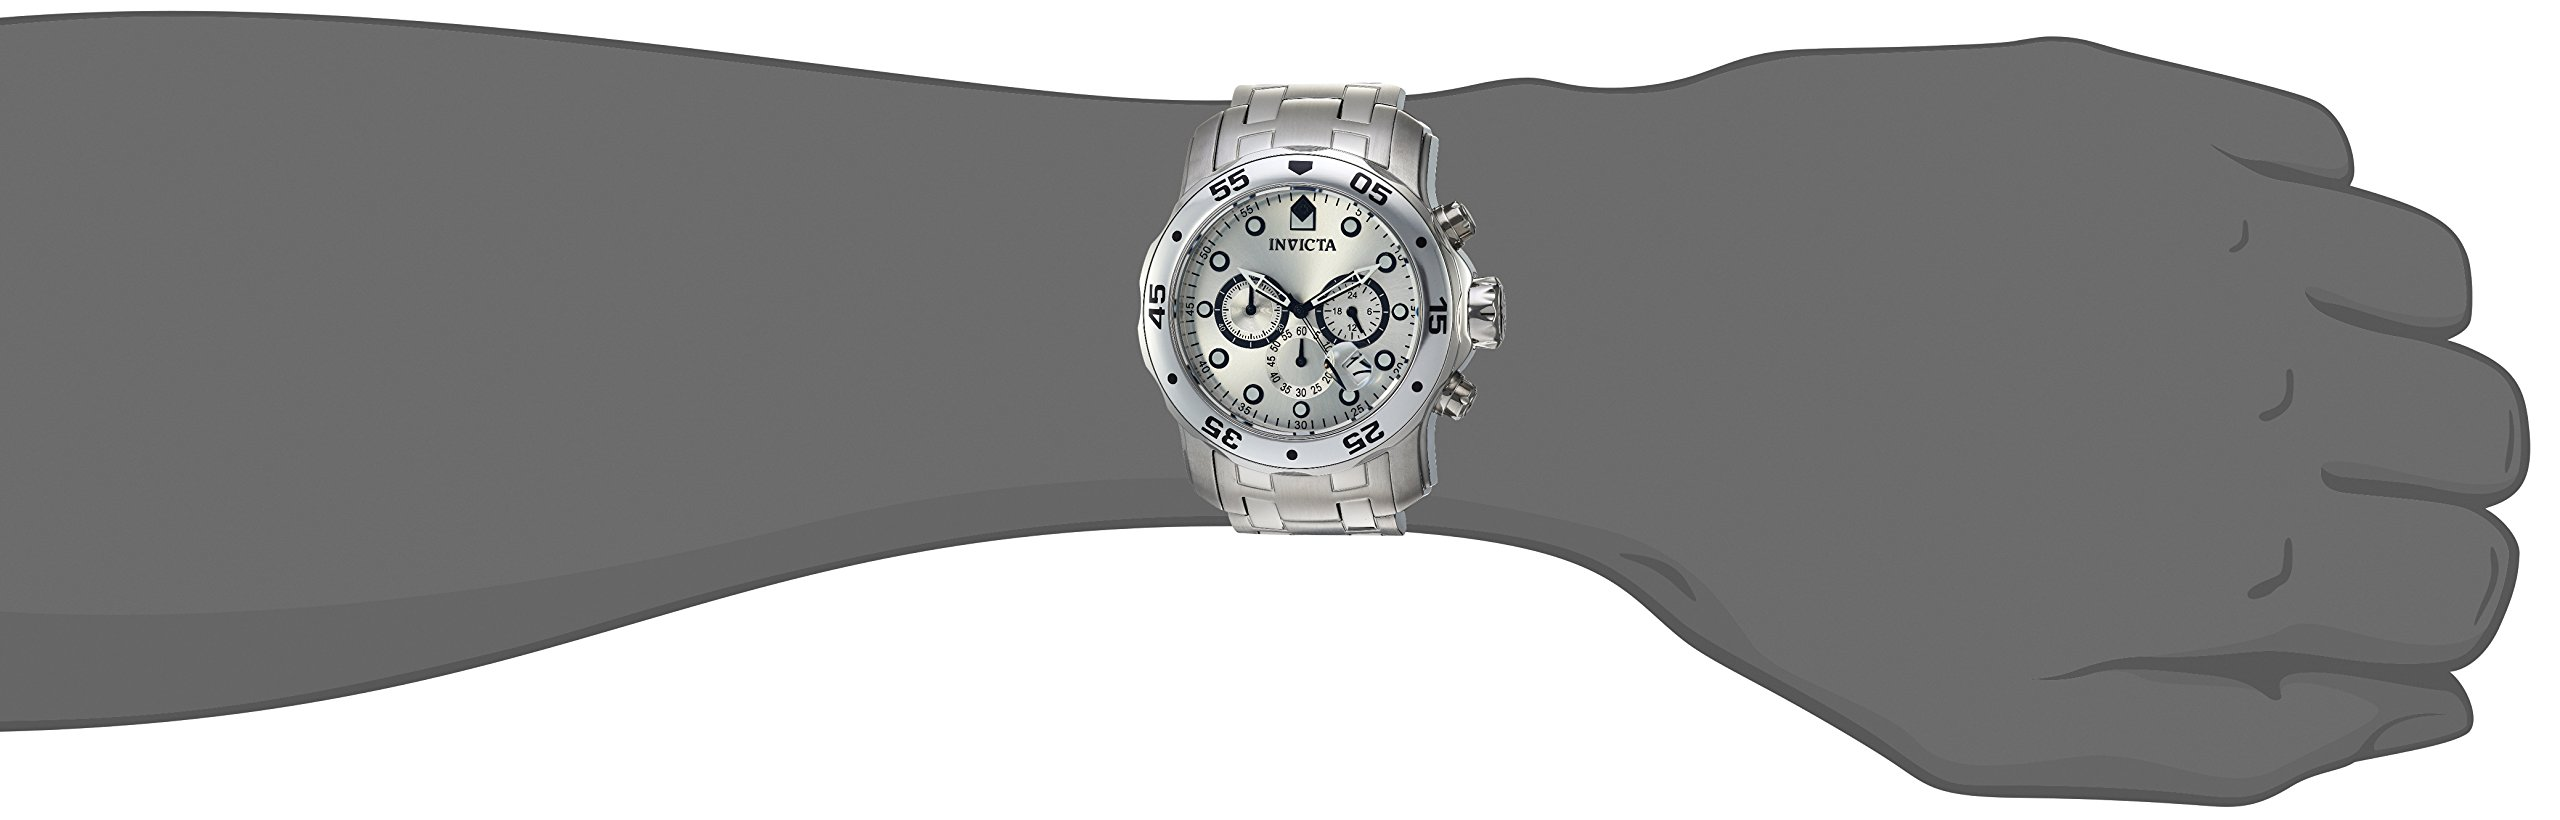 Invicta-0071-Pro-Diver-Scuba-Herren-Uhr-Edelstahl-Quarz-silbernen-Zifferblat